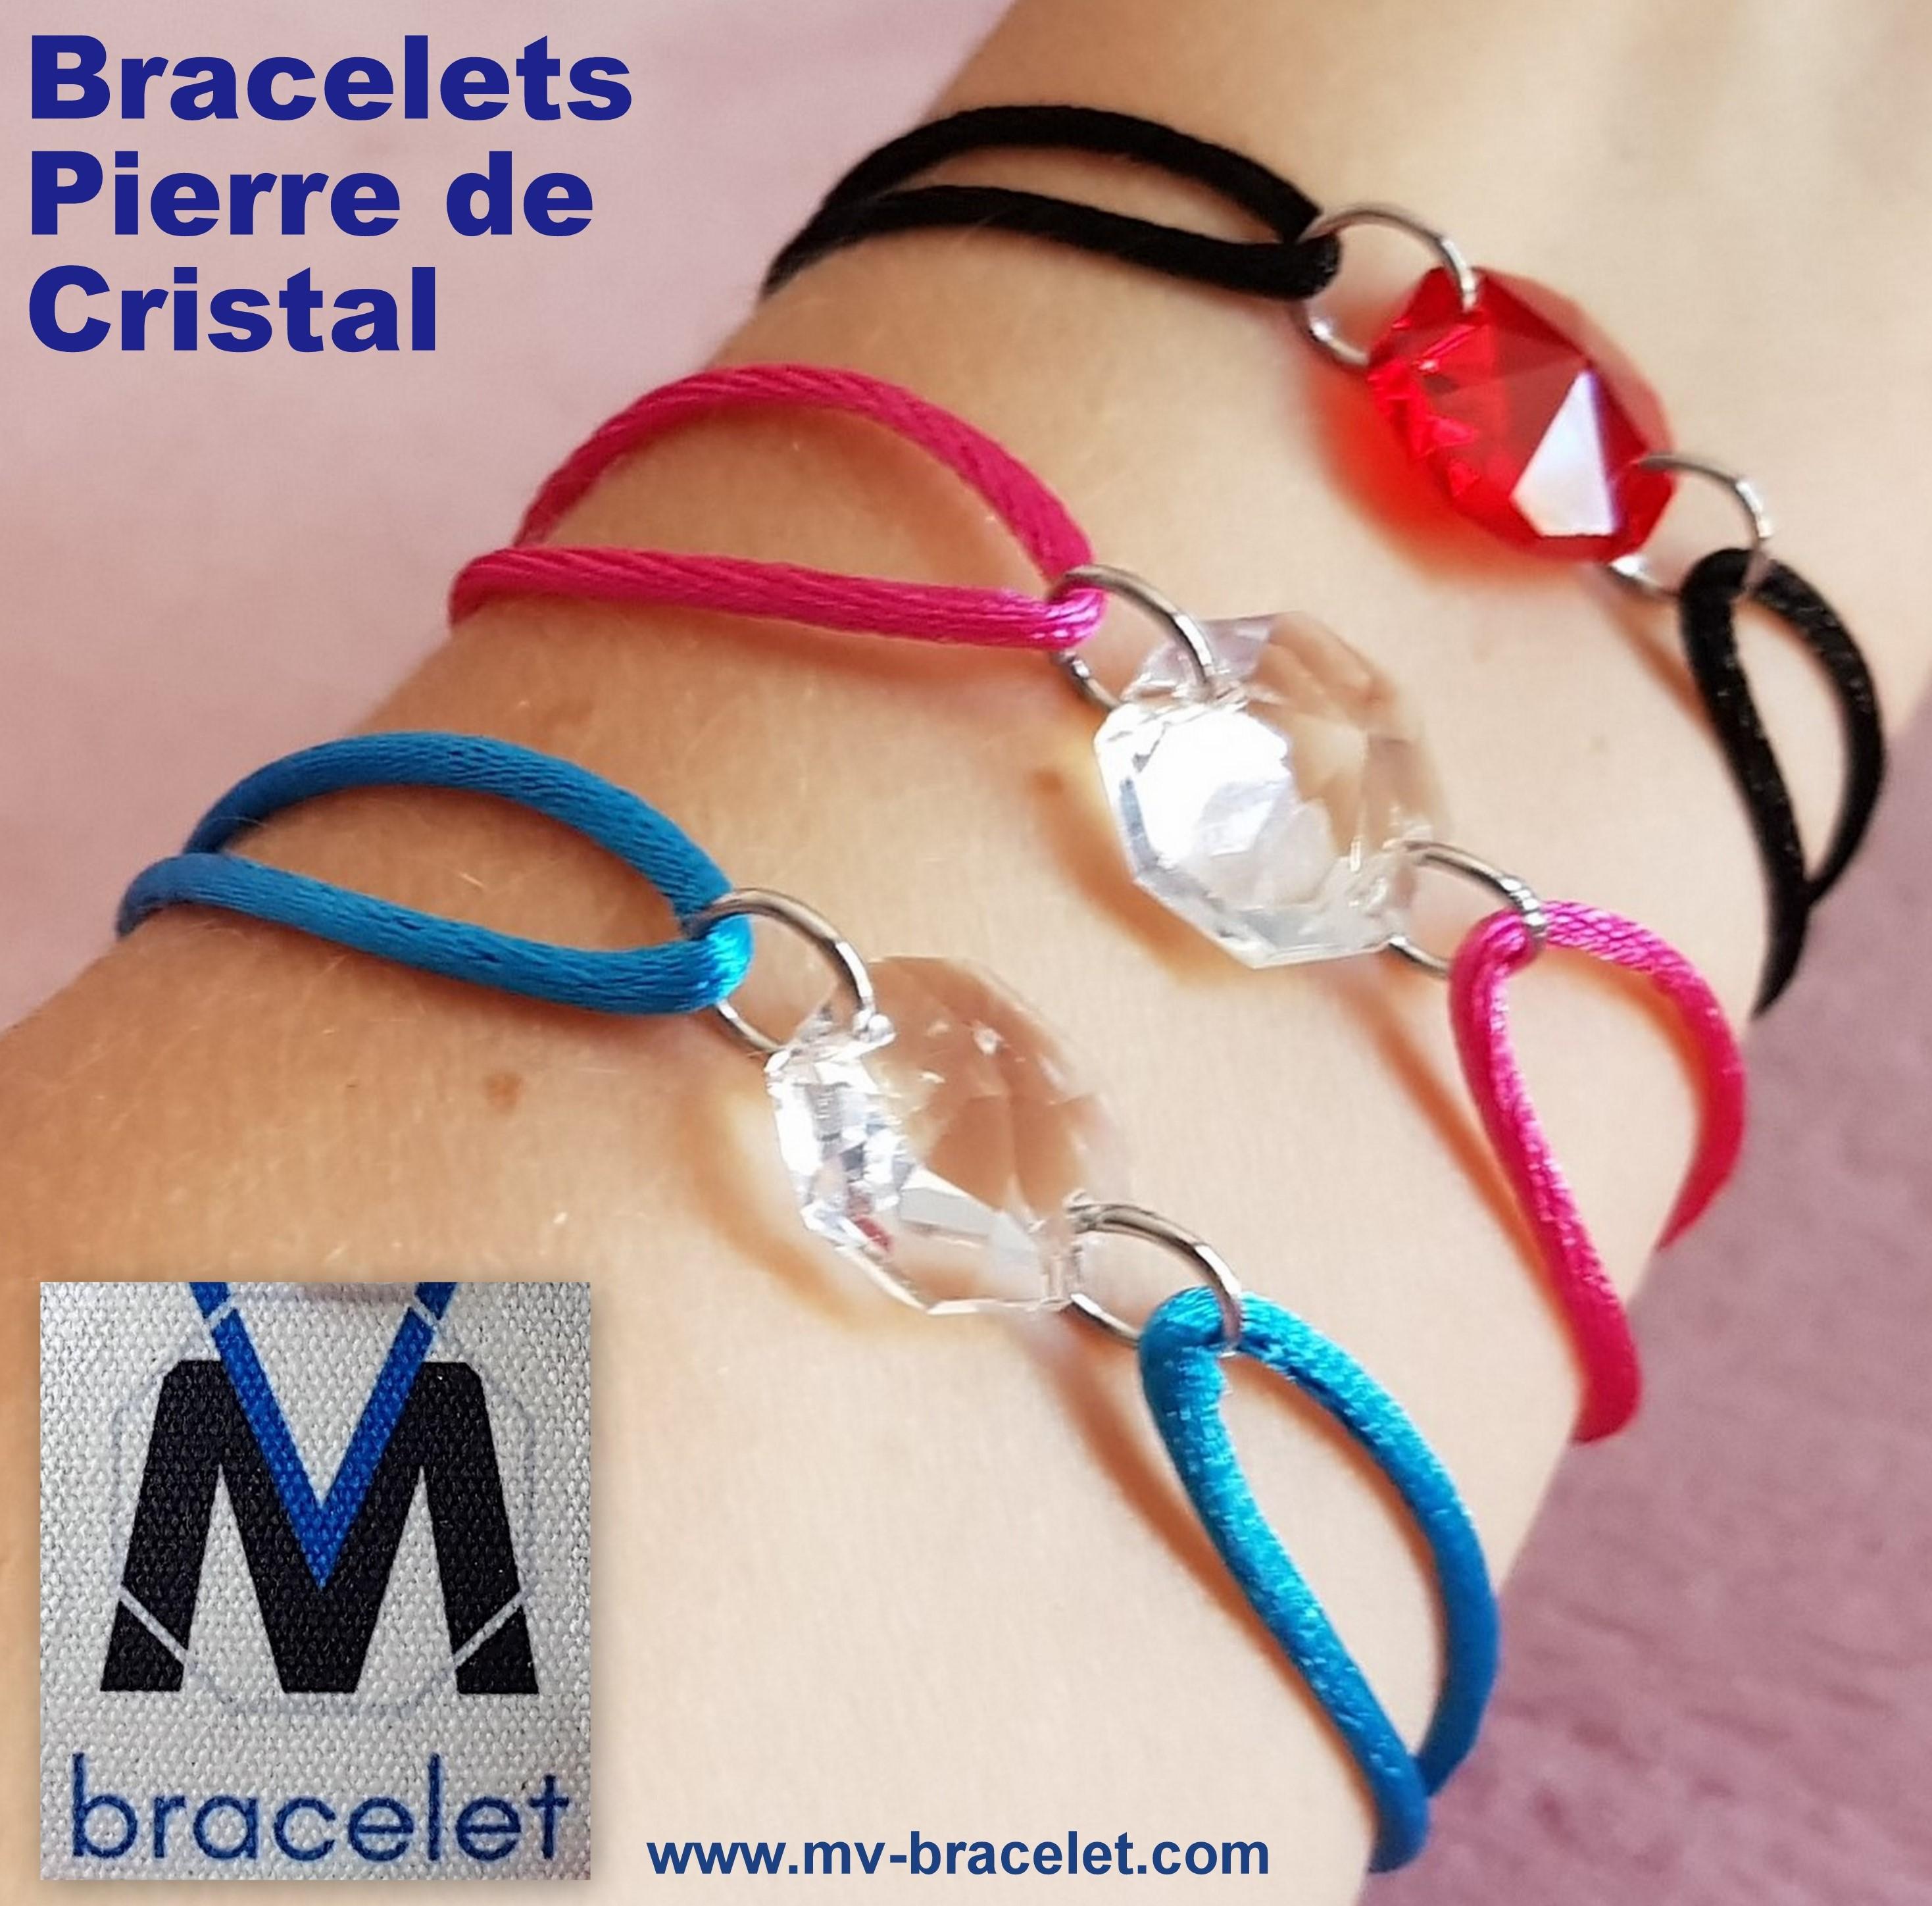 MV Bracelet - Pierre de Cristal